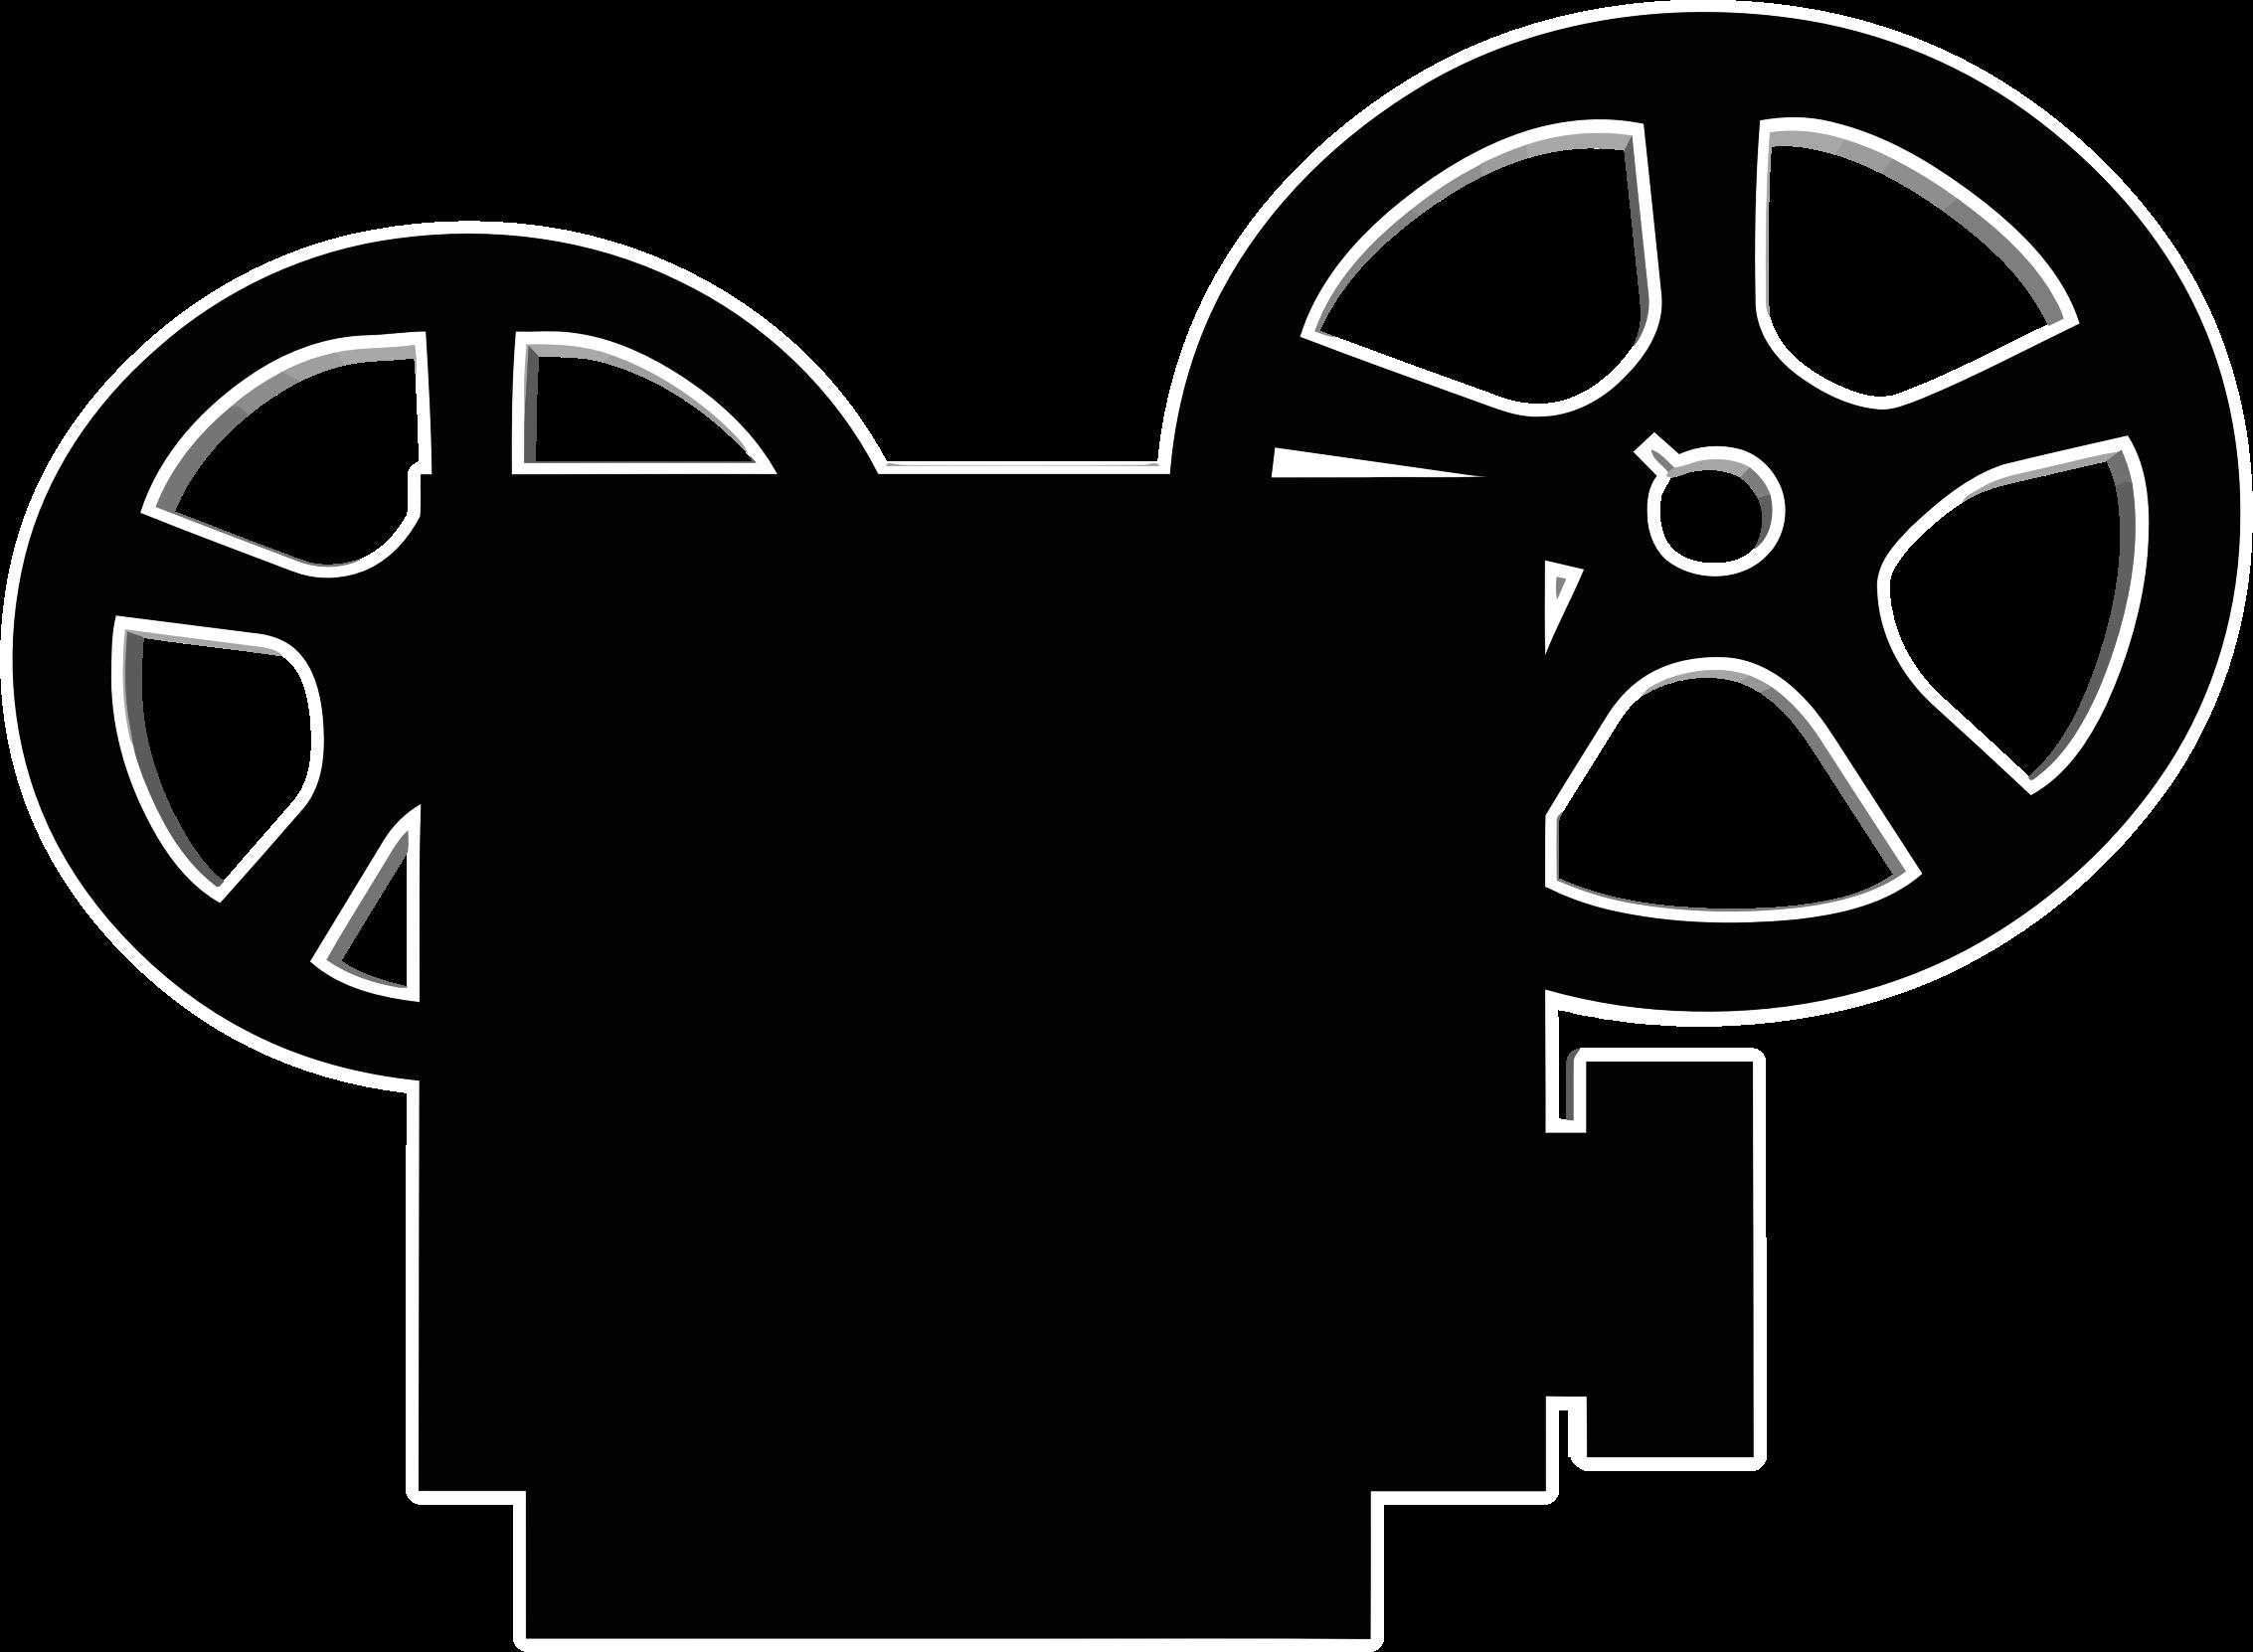 Movie clipart movie projector Icon Clipart Movie Projector Movie